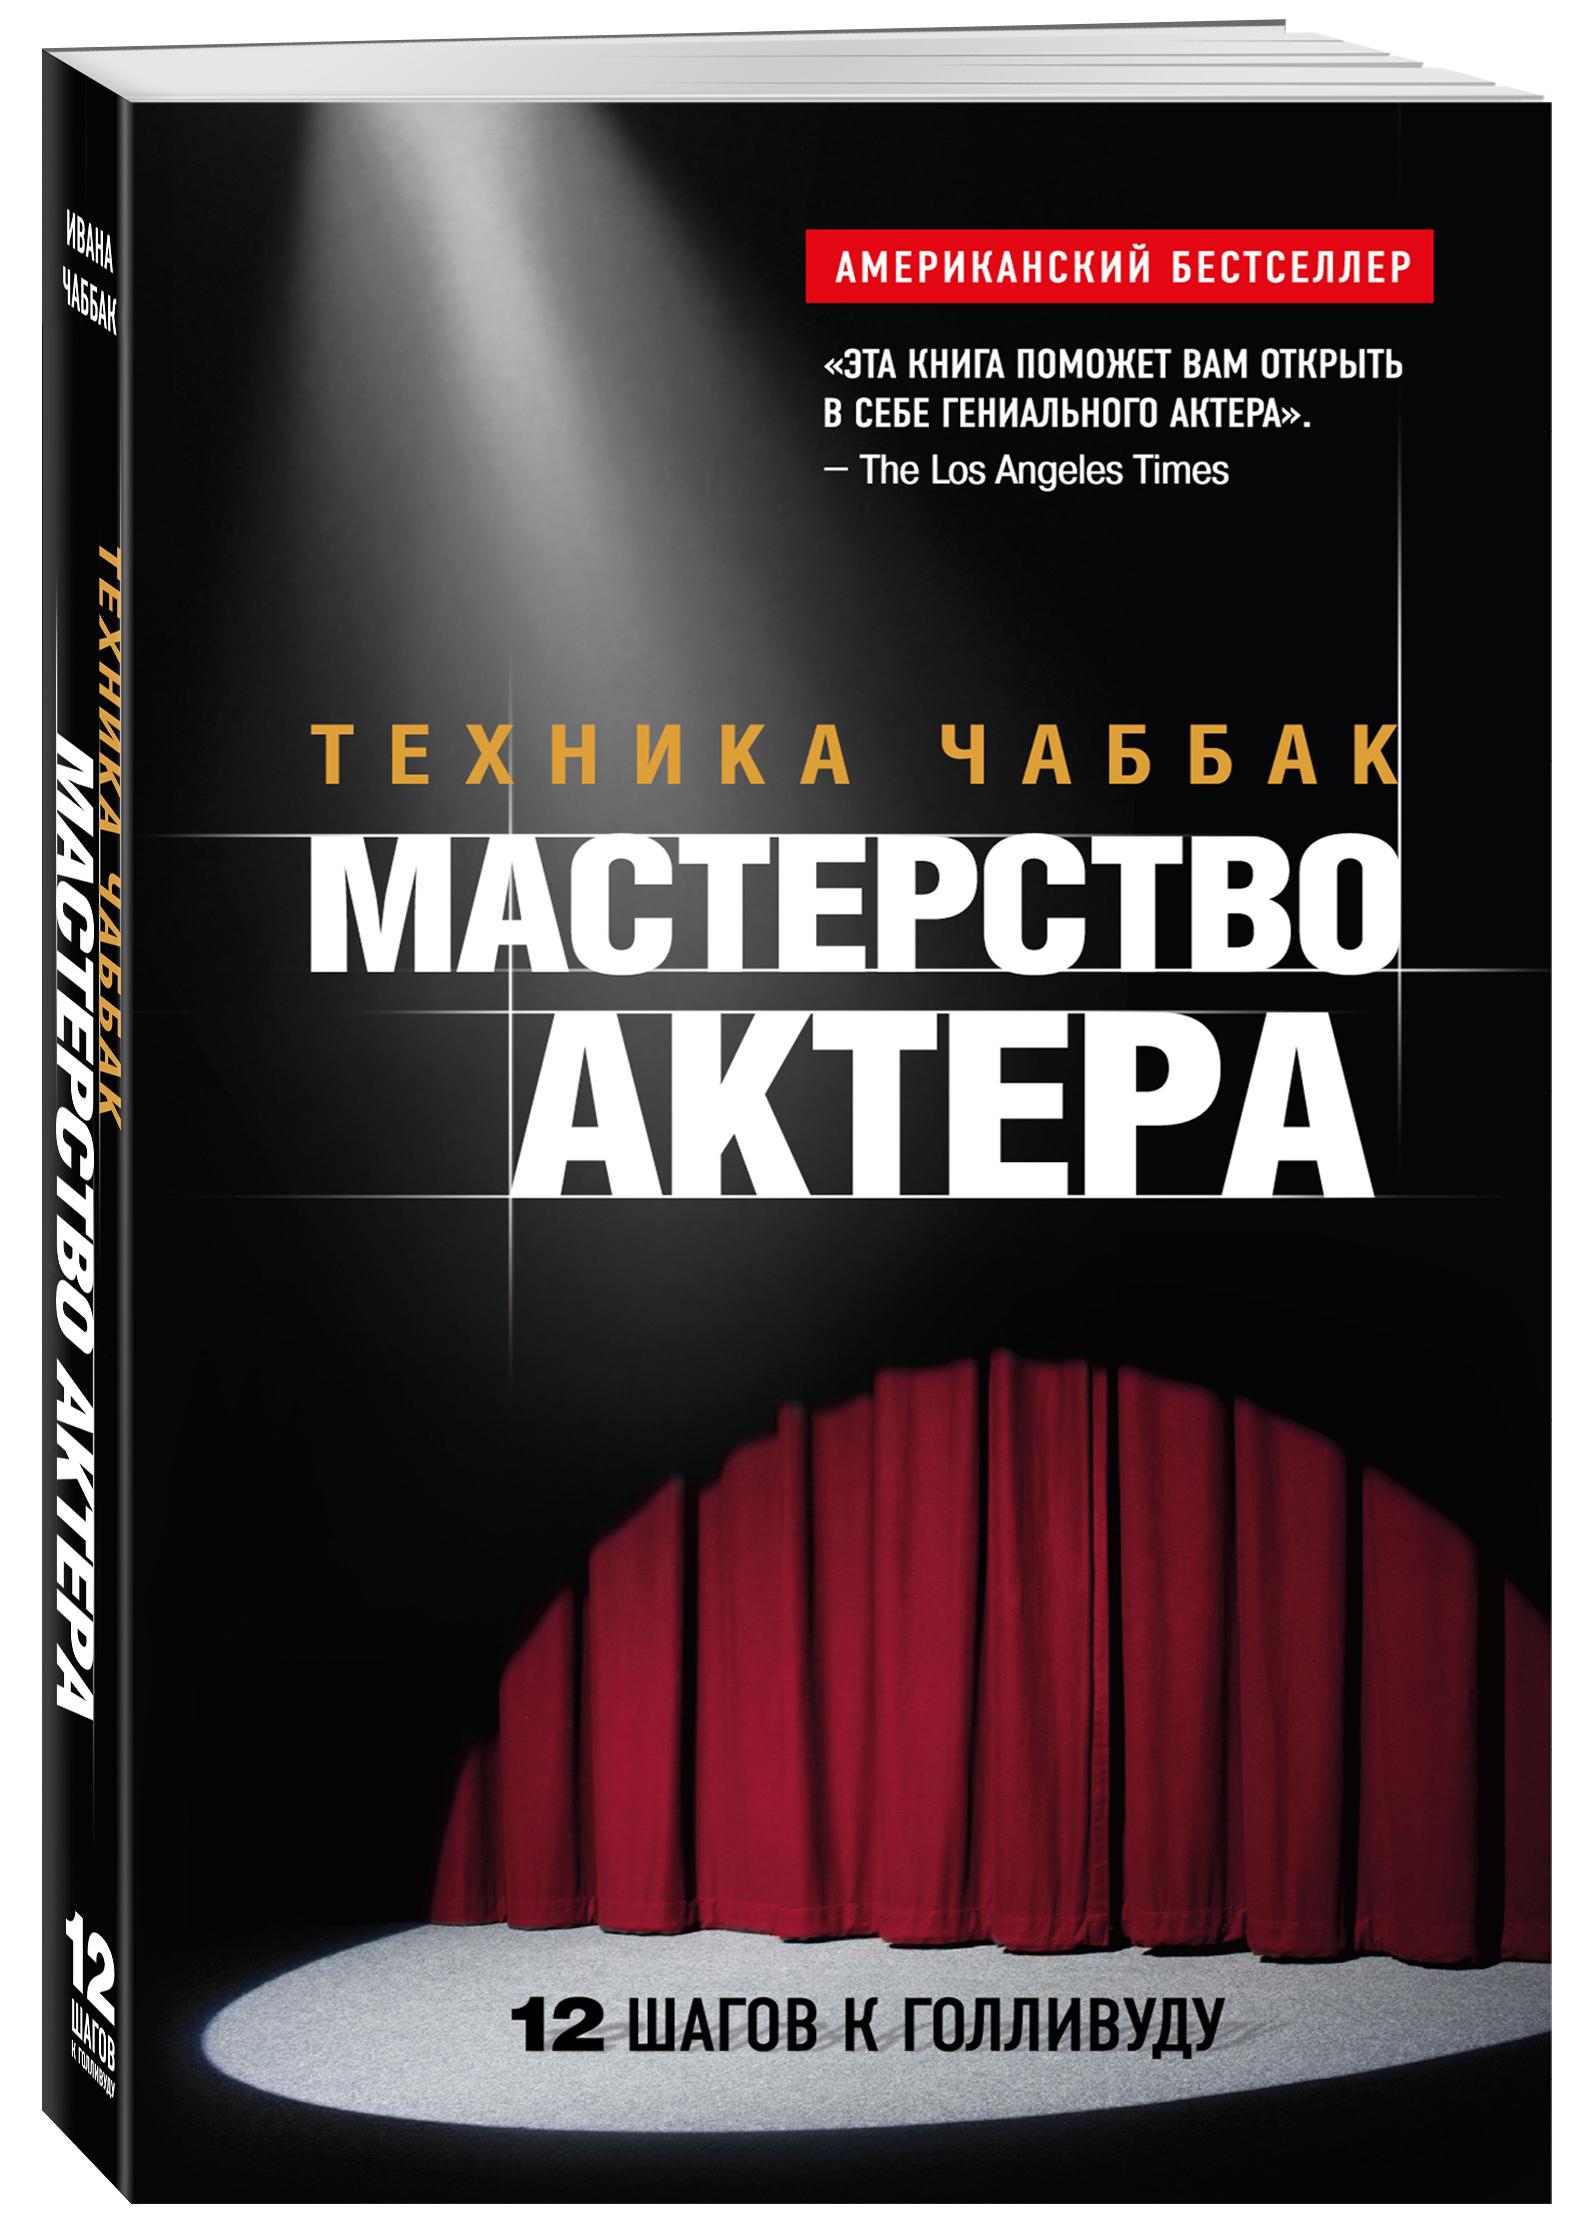 Ивана Чаббак Мастерство актера: Техника Чаббак ивана чаббак мастерство актера техника чаббак